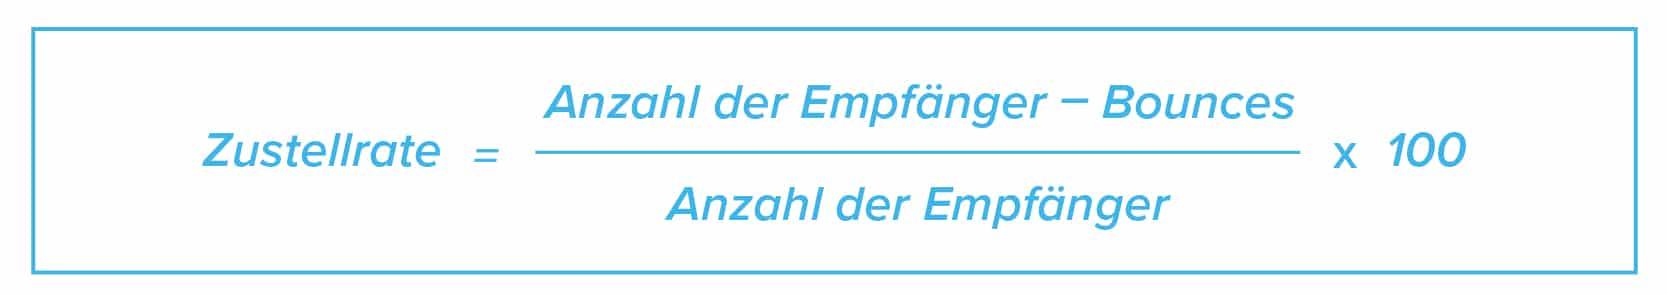 E-Mail Marketing KPIs Formel Zustellrate